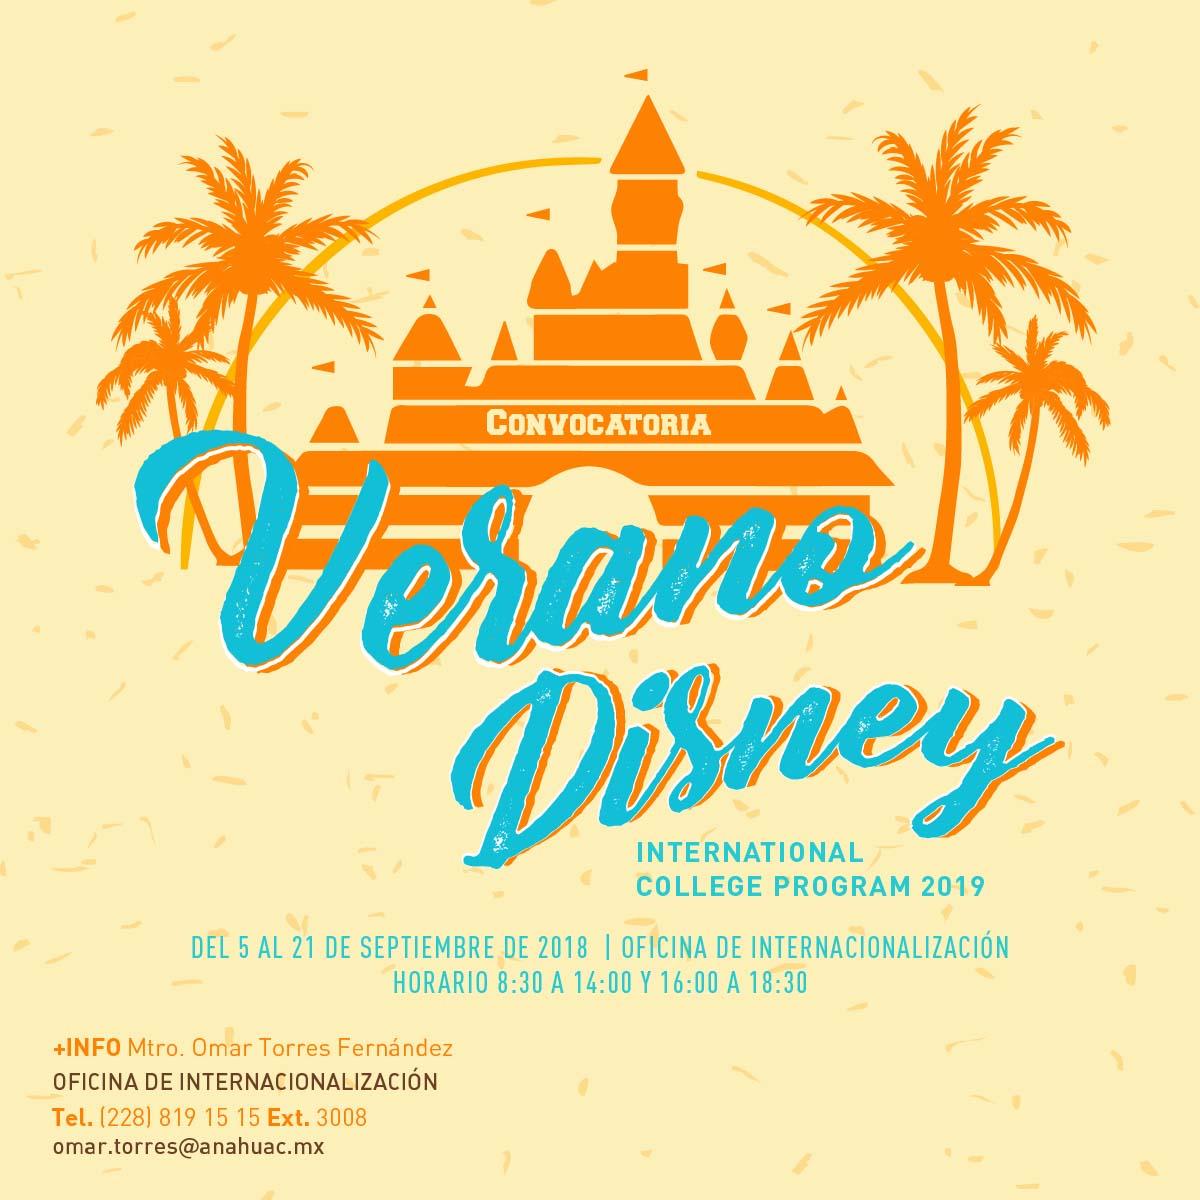 Verano Disney - International College Program 2019